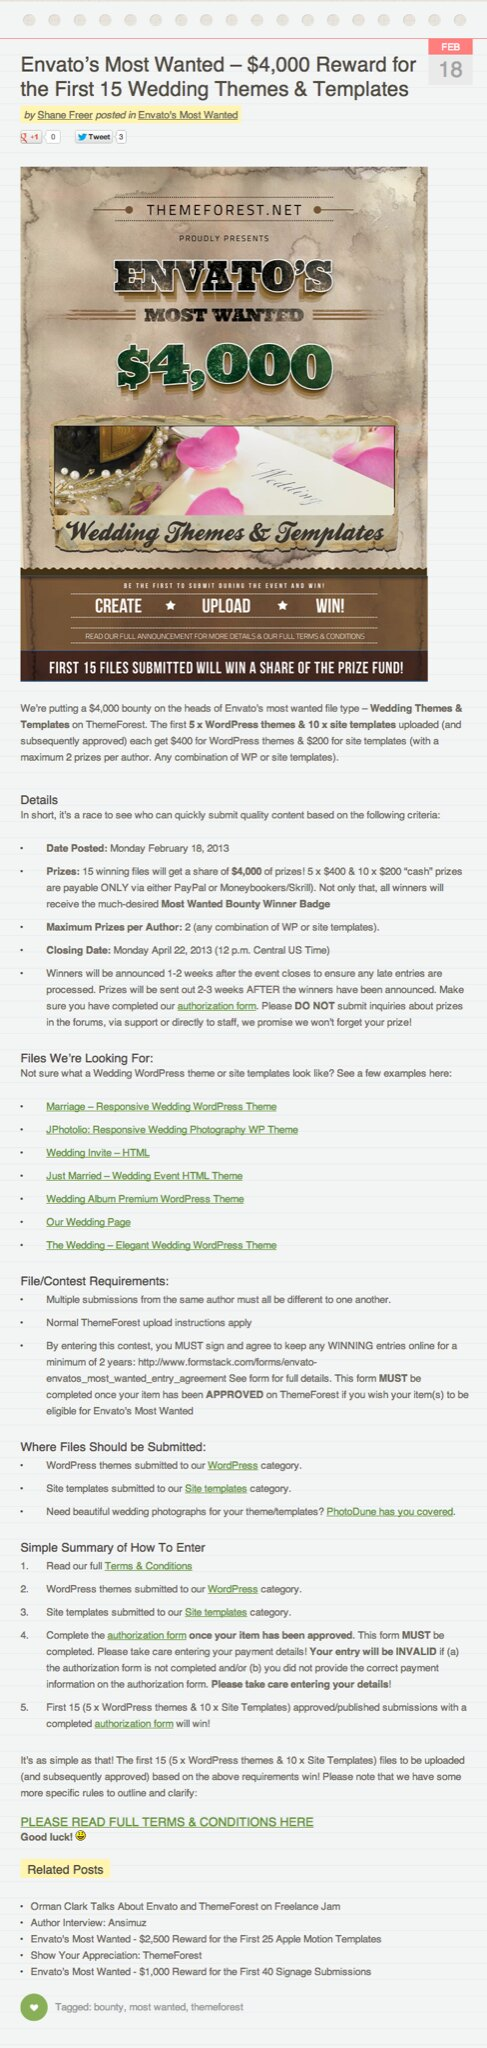 Envato-Most-Wanted-Web-Development-Idea